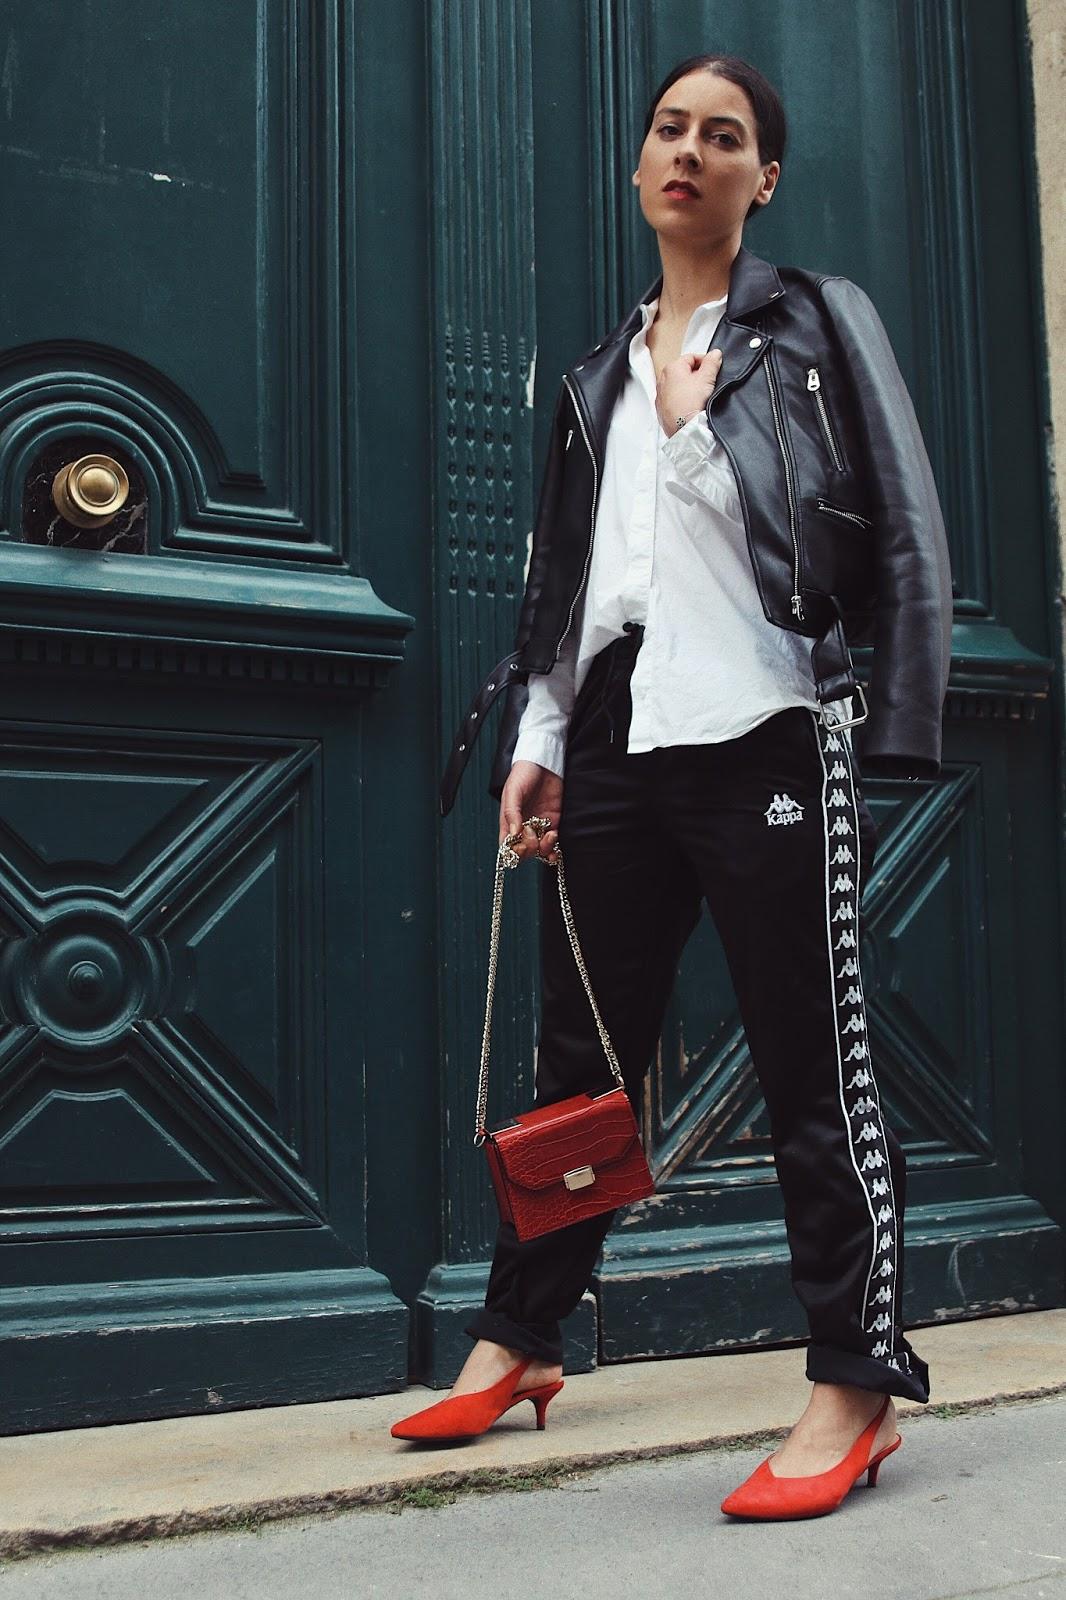 blog de mode avec look jogging kappa perfecto tendance printemps